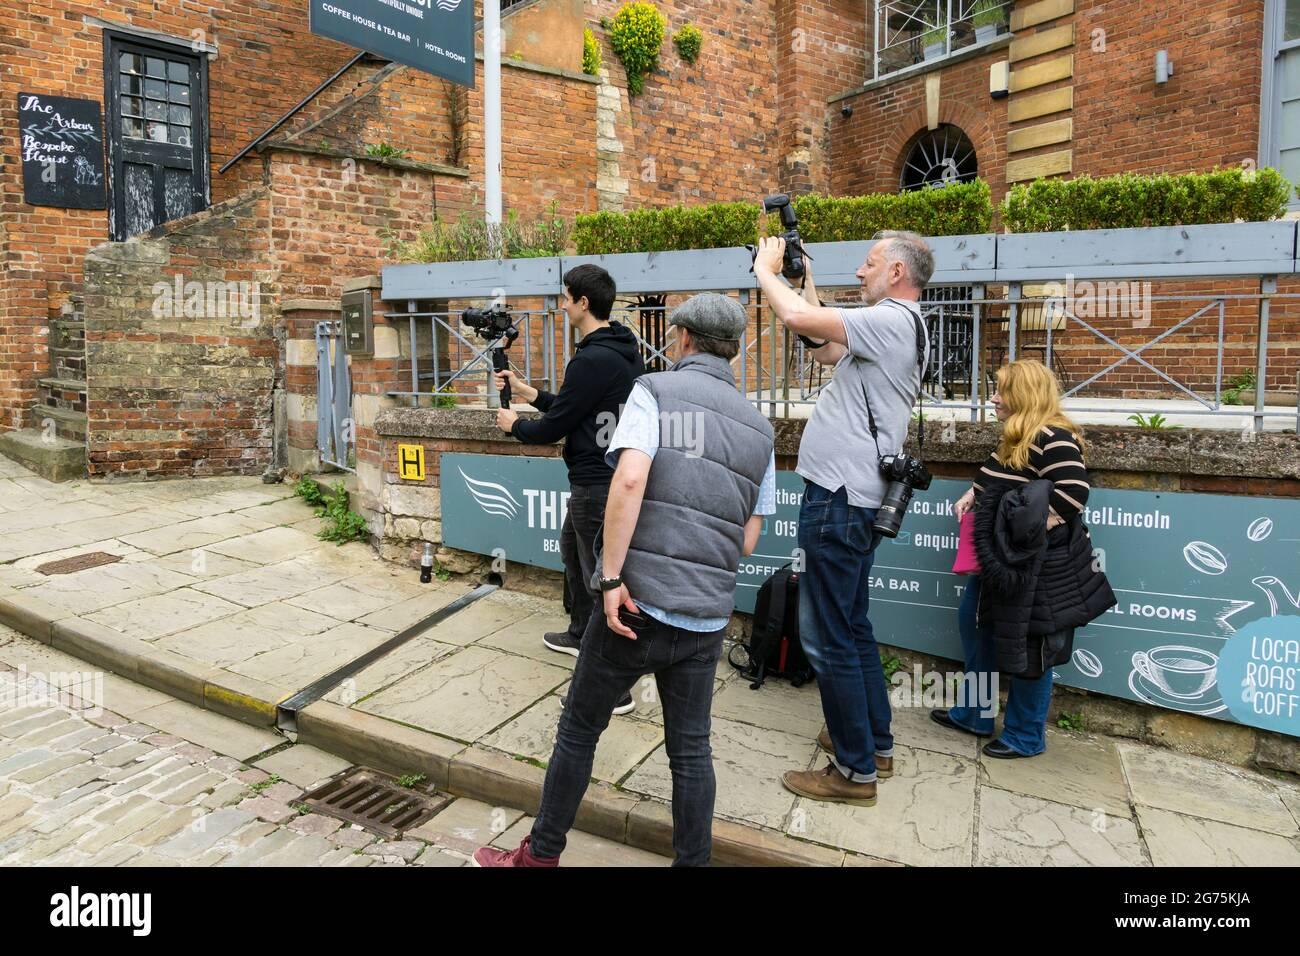 film-crew-filming-an-actor-on-steep-hill-lincoln-city-2G75KJA.jpg